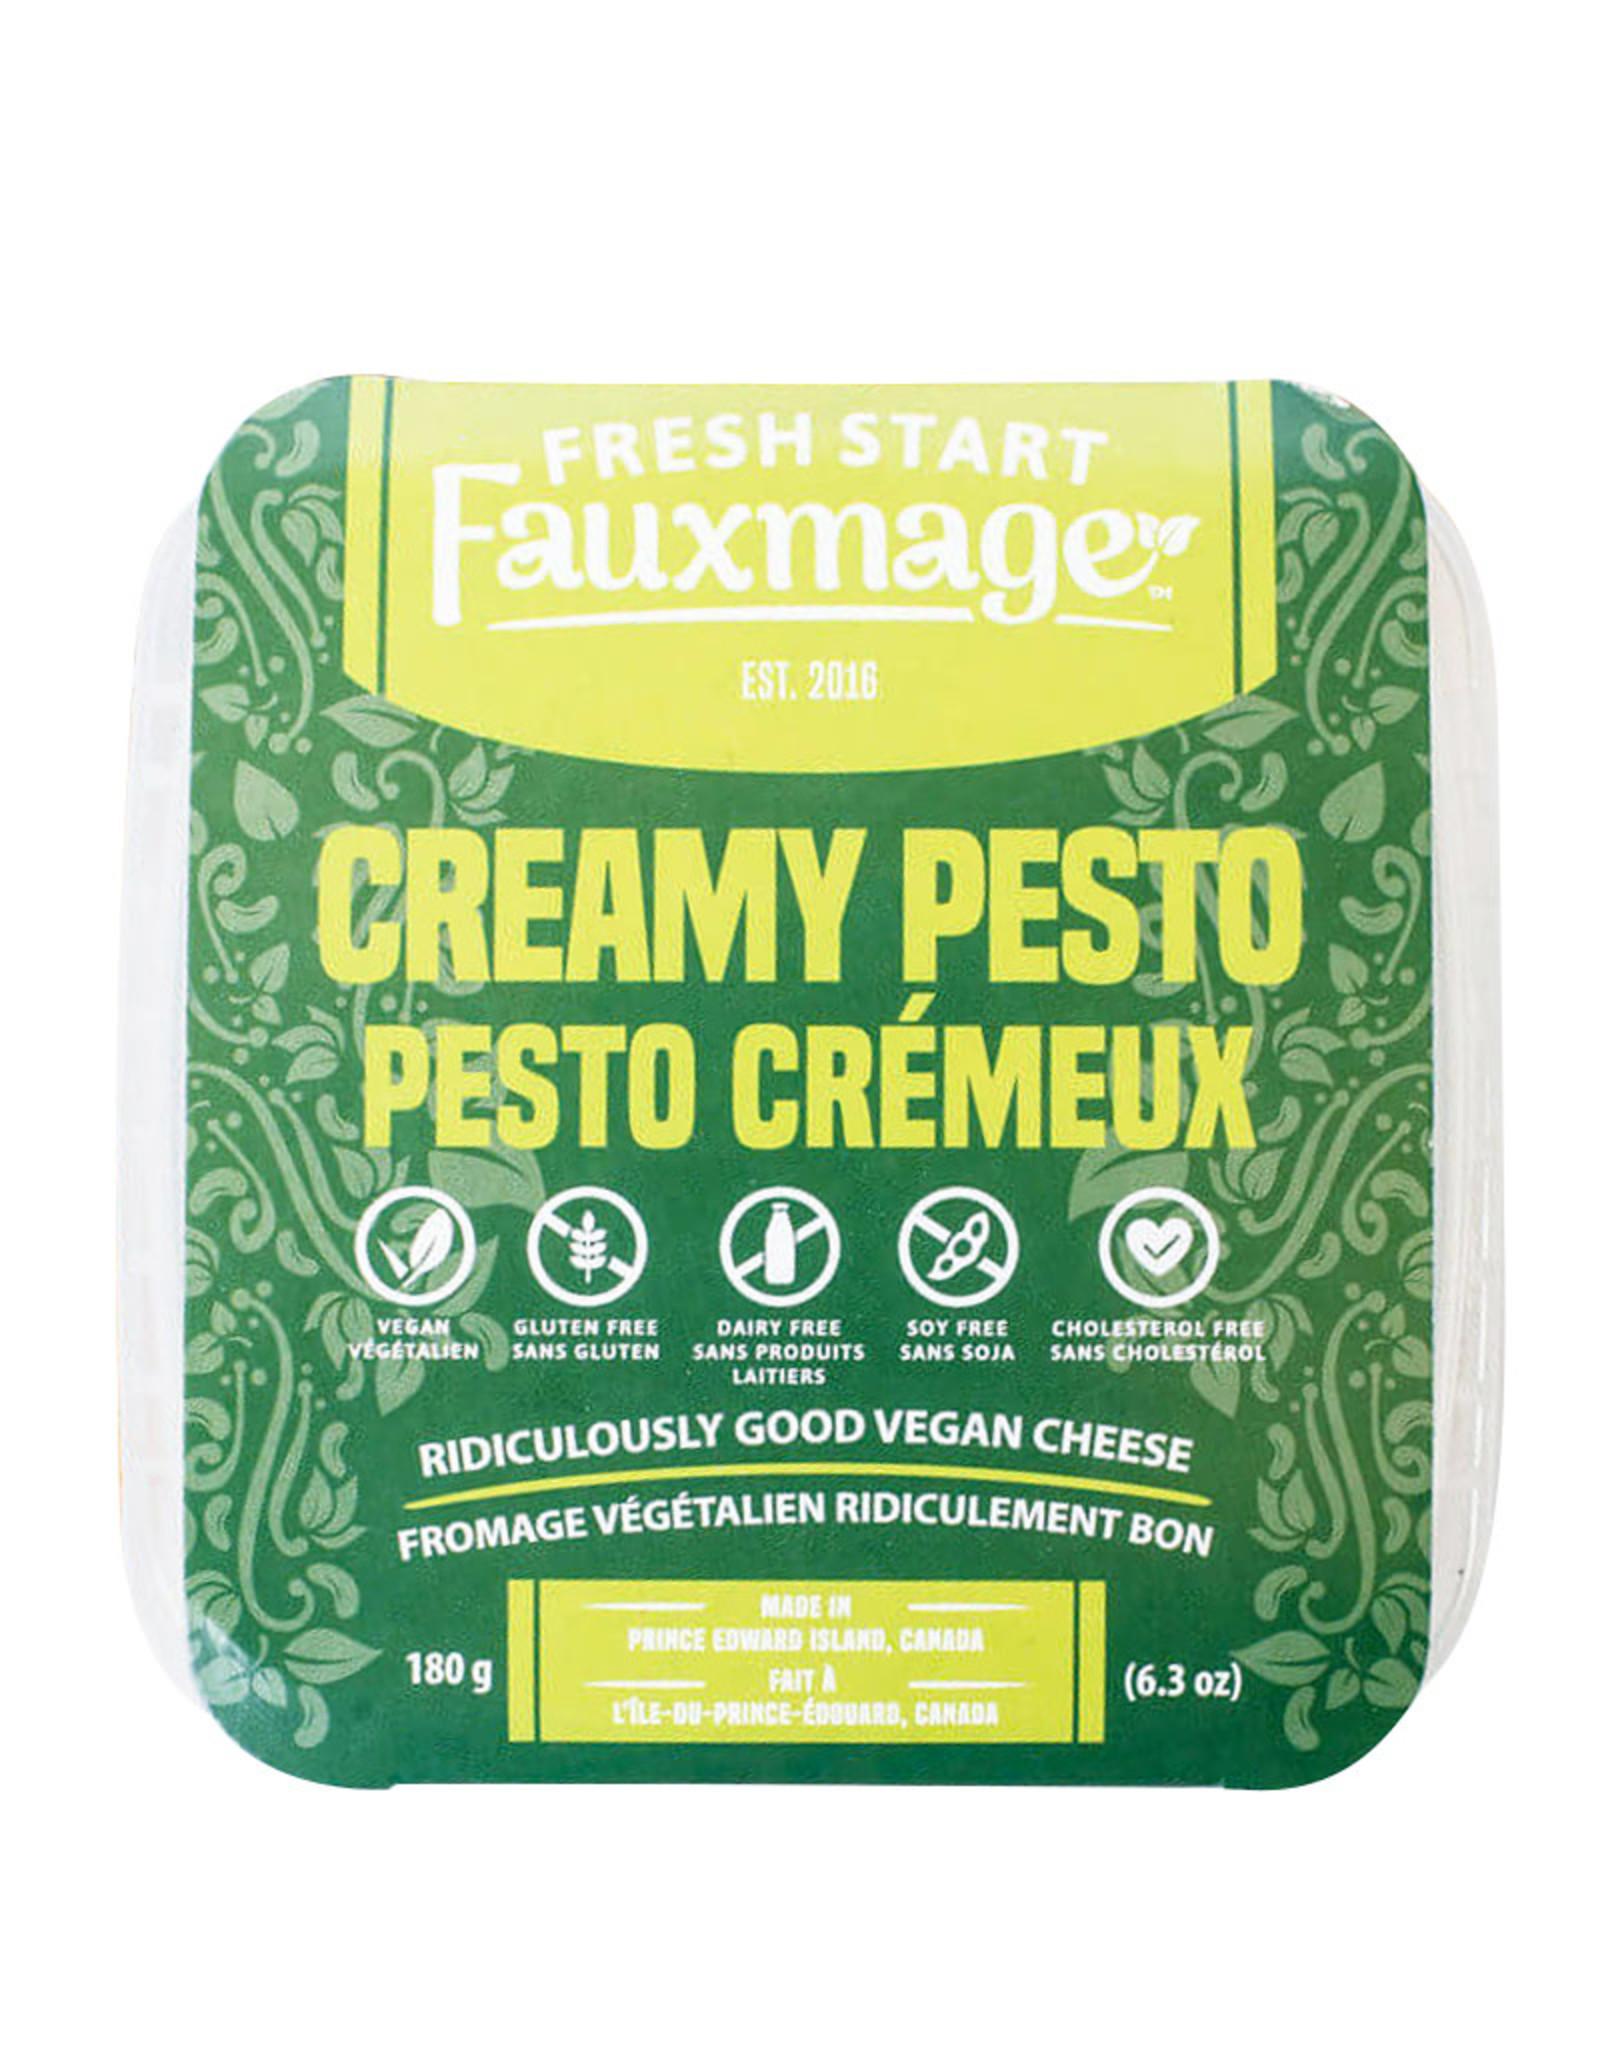 Fresh Start Fauxmage Fresh Start Fauxmage - Creamy Pesto (180g)